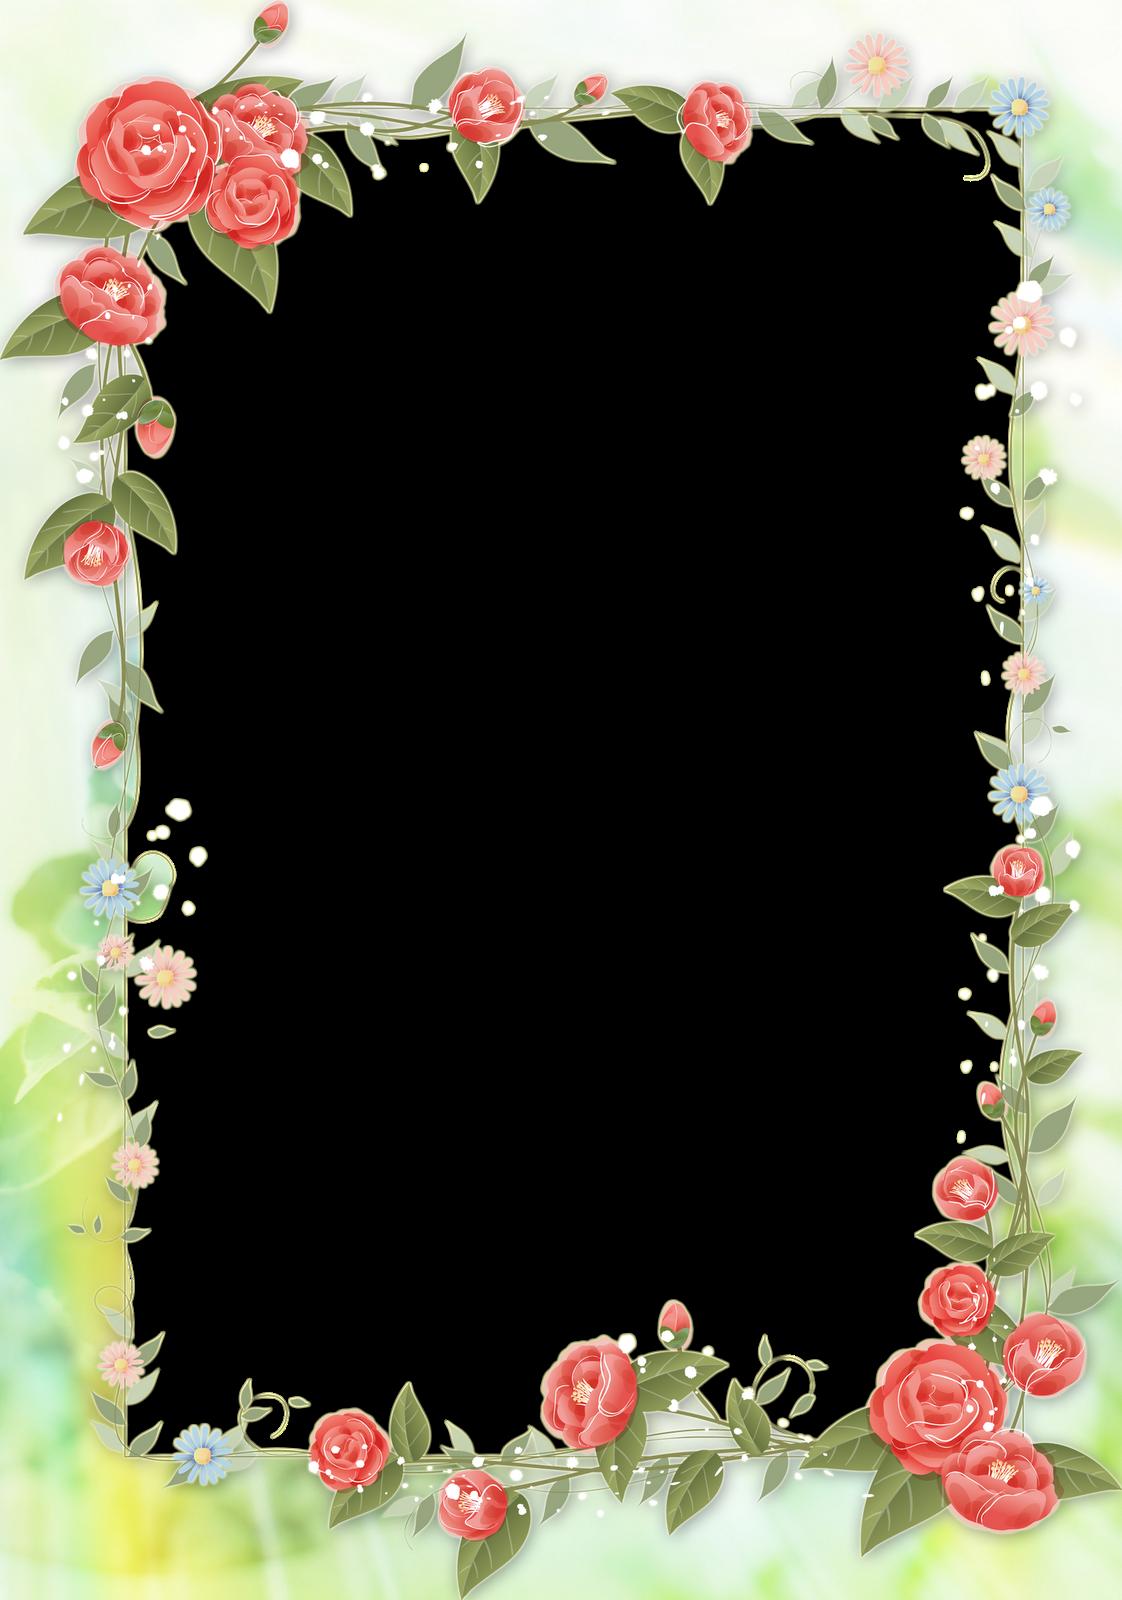 Photoshop Png Frames Wallpapers Designs Flower Frame Pack